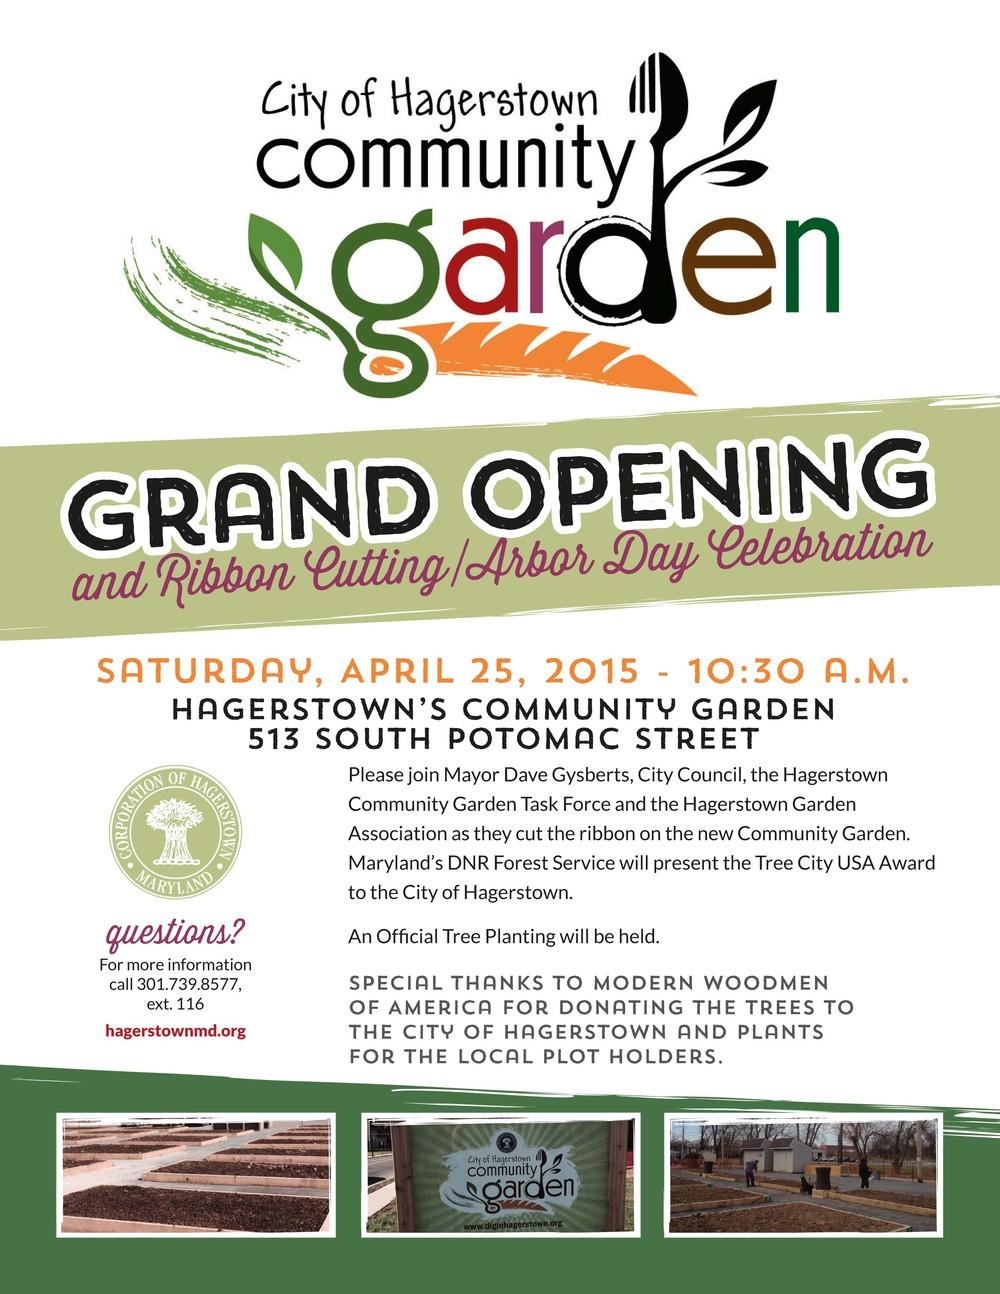 city of hagerstown community garden flyer camacho designs